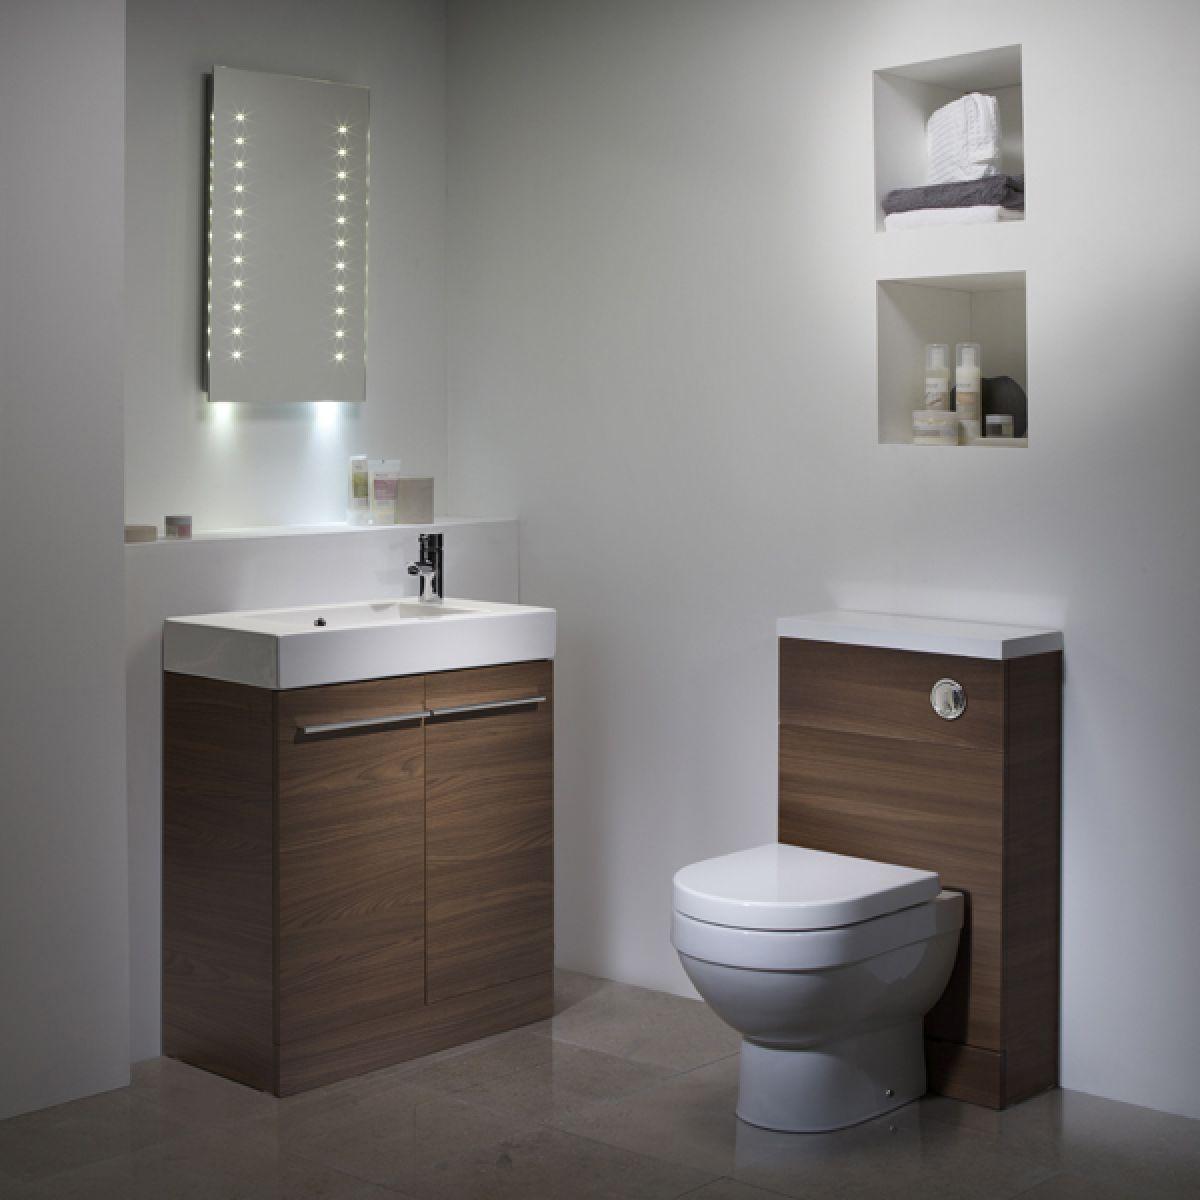 Tavistock Kobe Walnut Bathroom Furniture Lifestyle